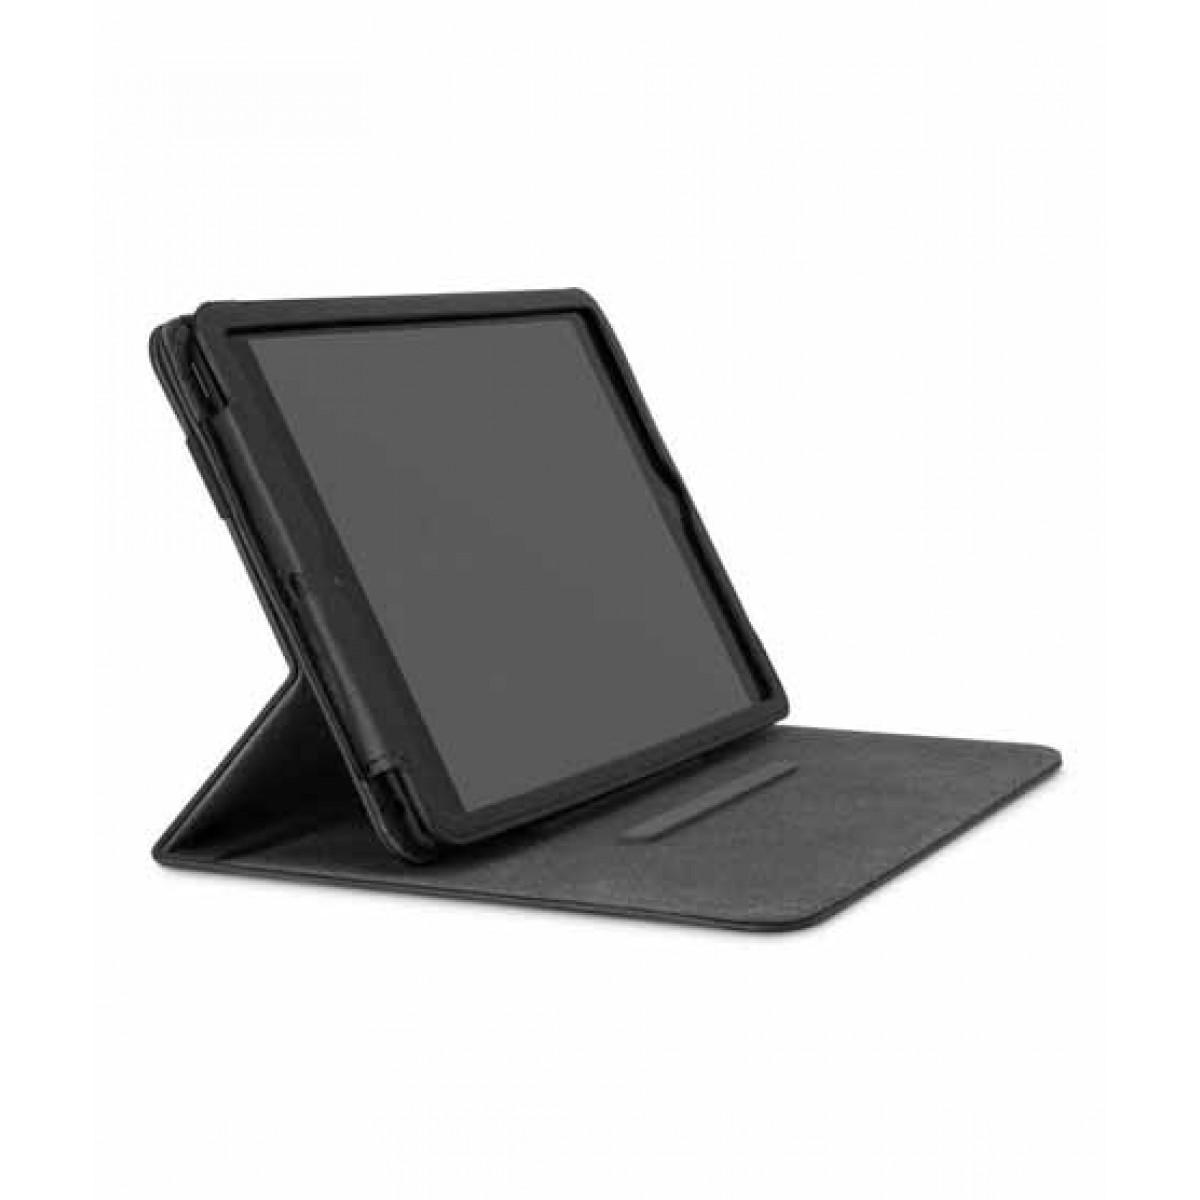 Incase Book Jacket Case for iPad Mini Retina Black